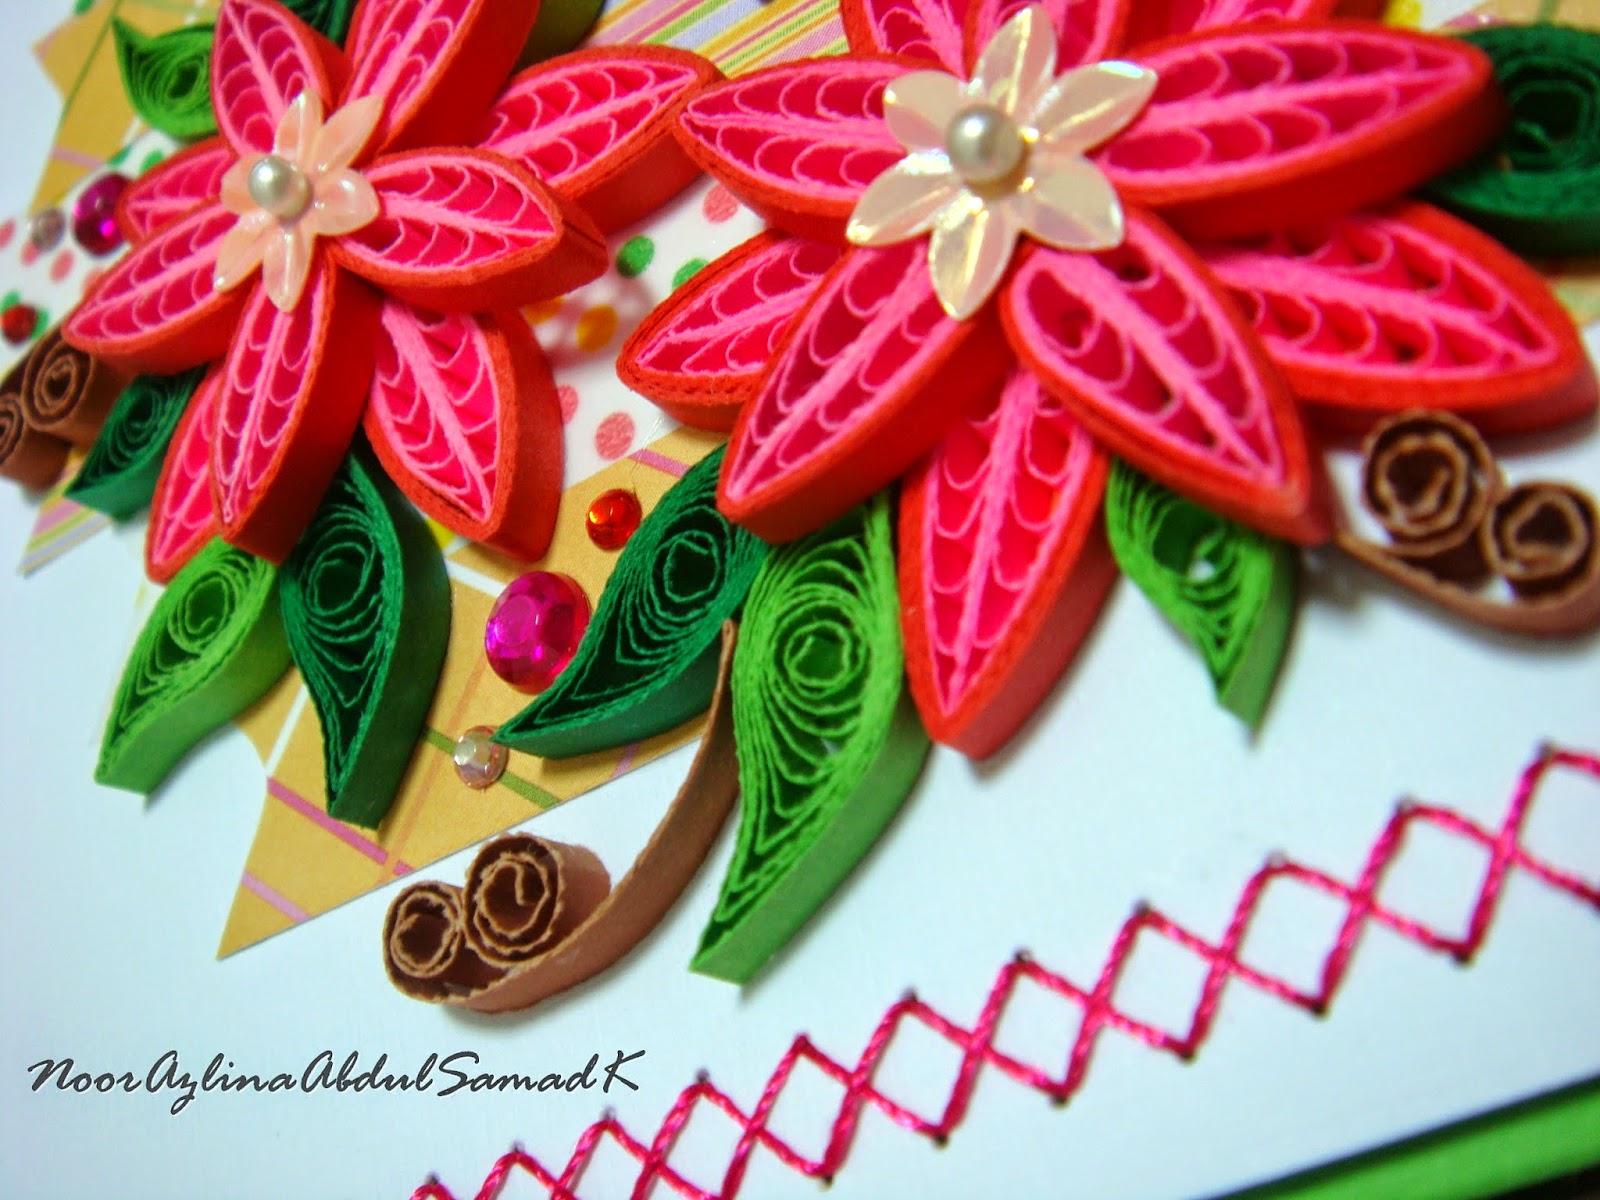 Double star loop flower pop up birthday card handmade art crochet double star loop flower pop up birthday card izmirmasajfo